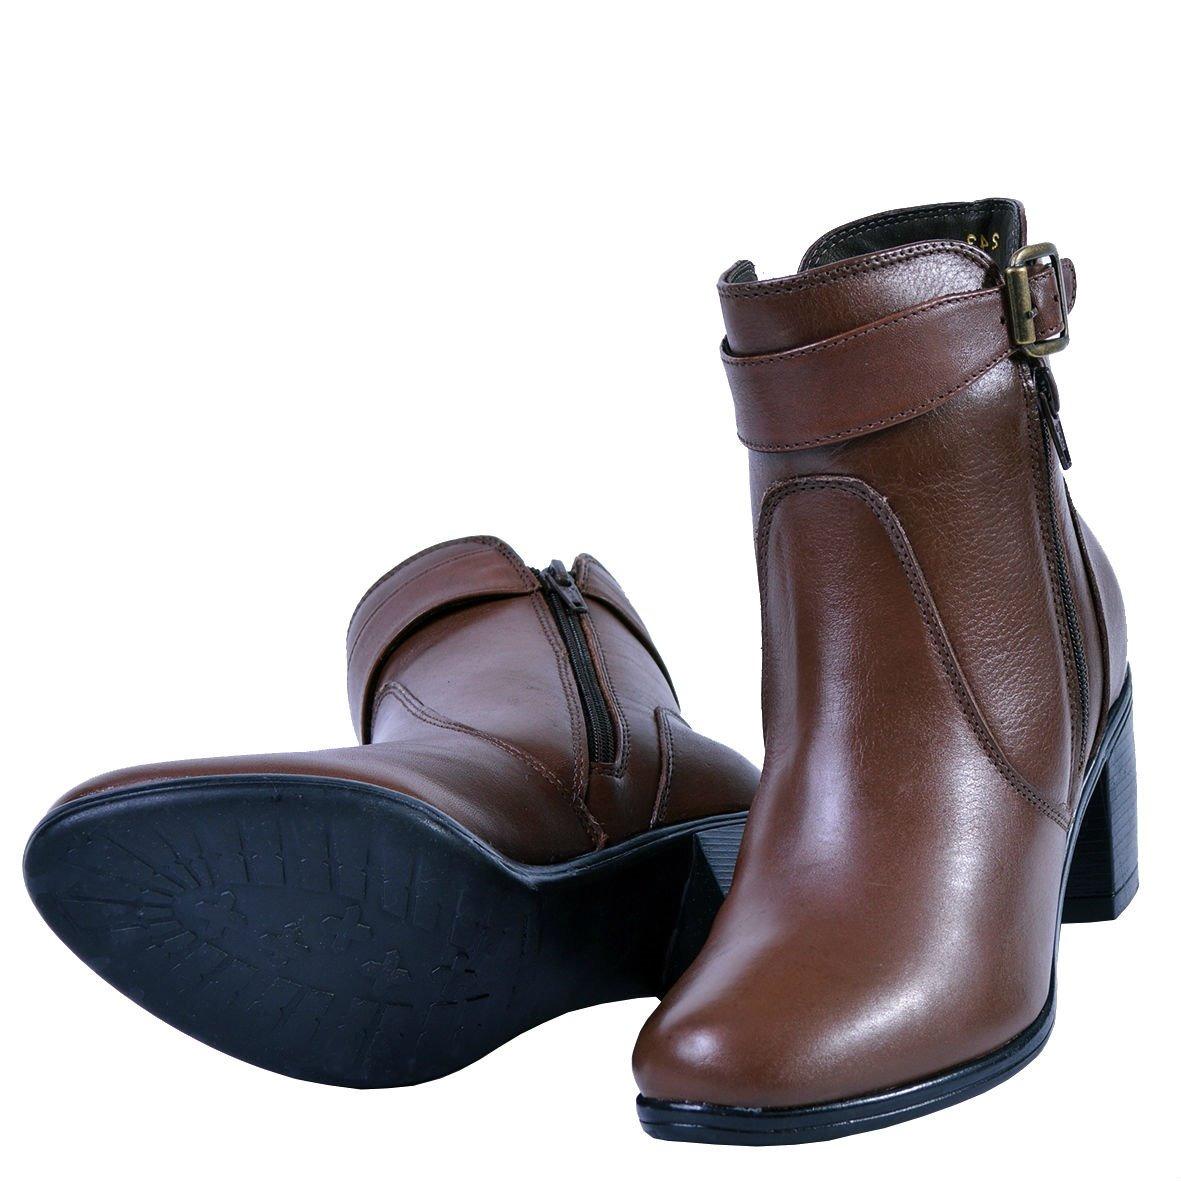 f0132d0ae coturno baixo feminino bota marrom e preto estiloso 243. Carregando zoom.